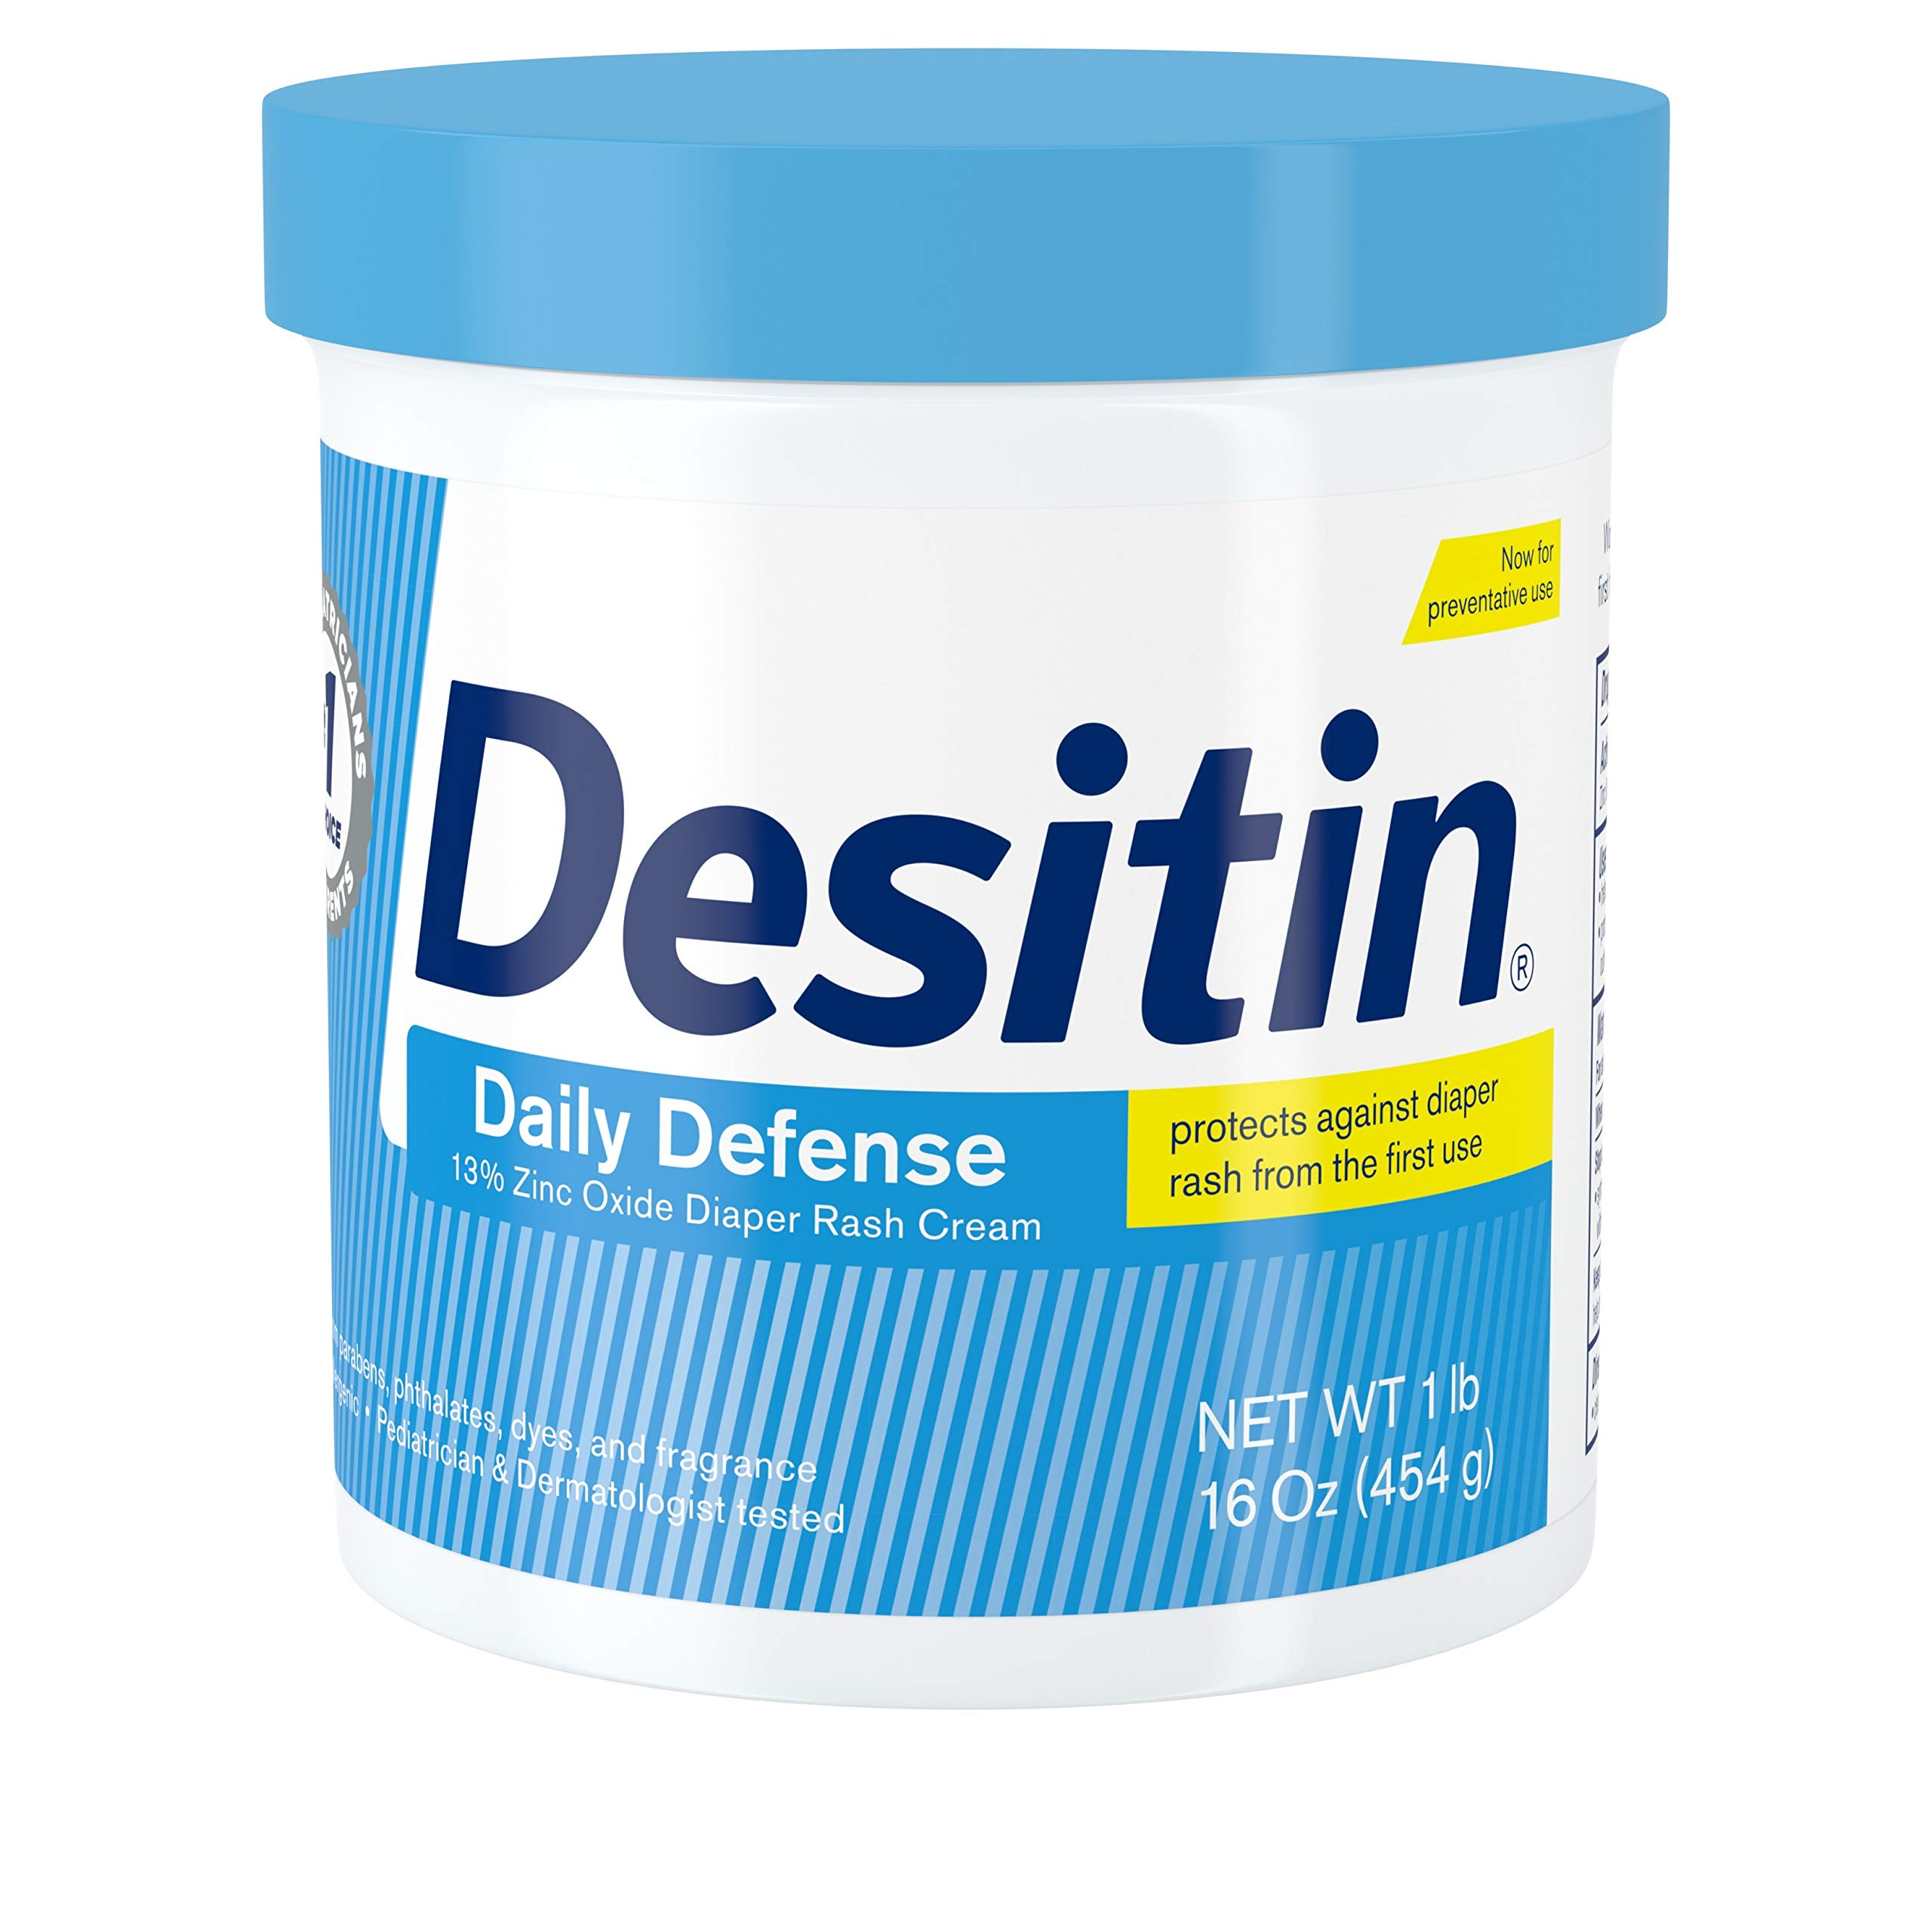 Desitin Daily Defense Baby Diaper Rash Cream with Zinc Oxide to Treat, Relieve & Prevent diaper rash, 16 oz by Desitin (Image #1)